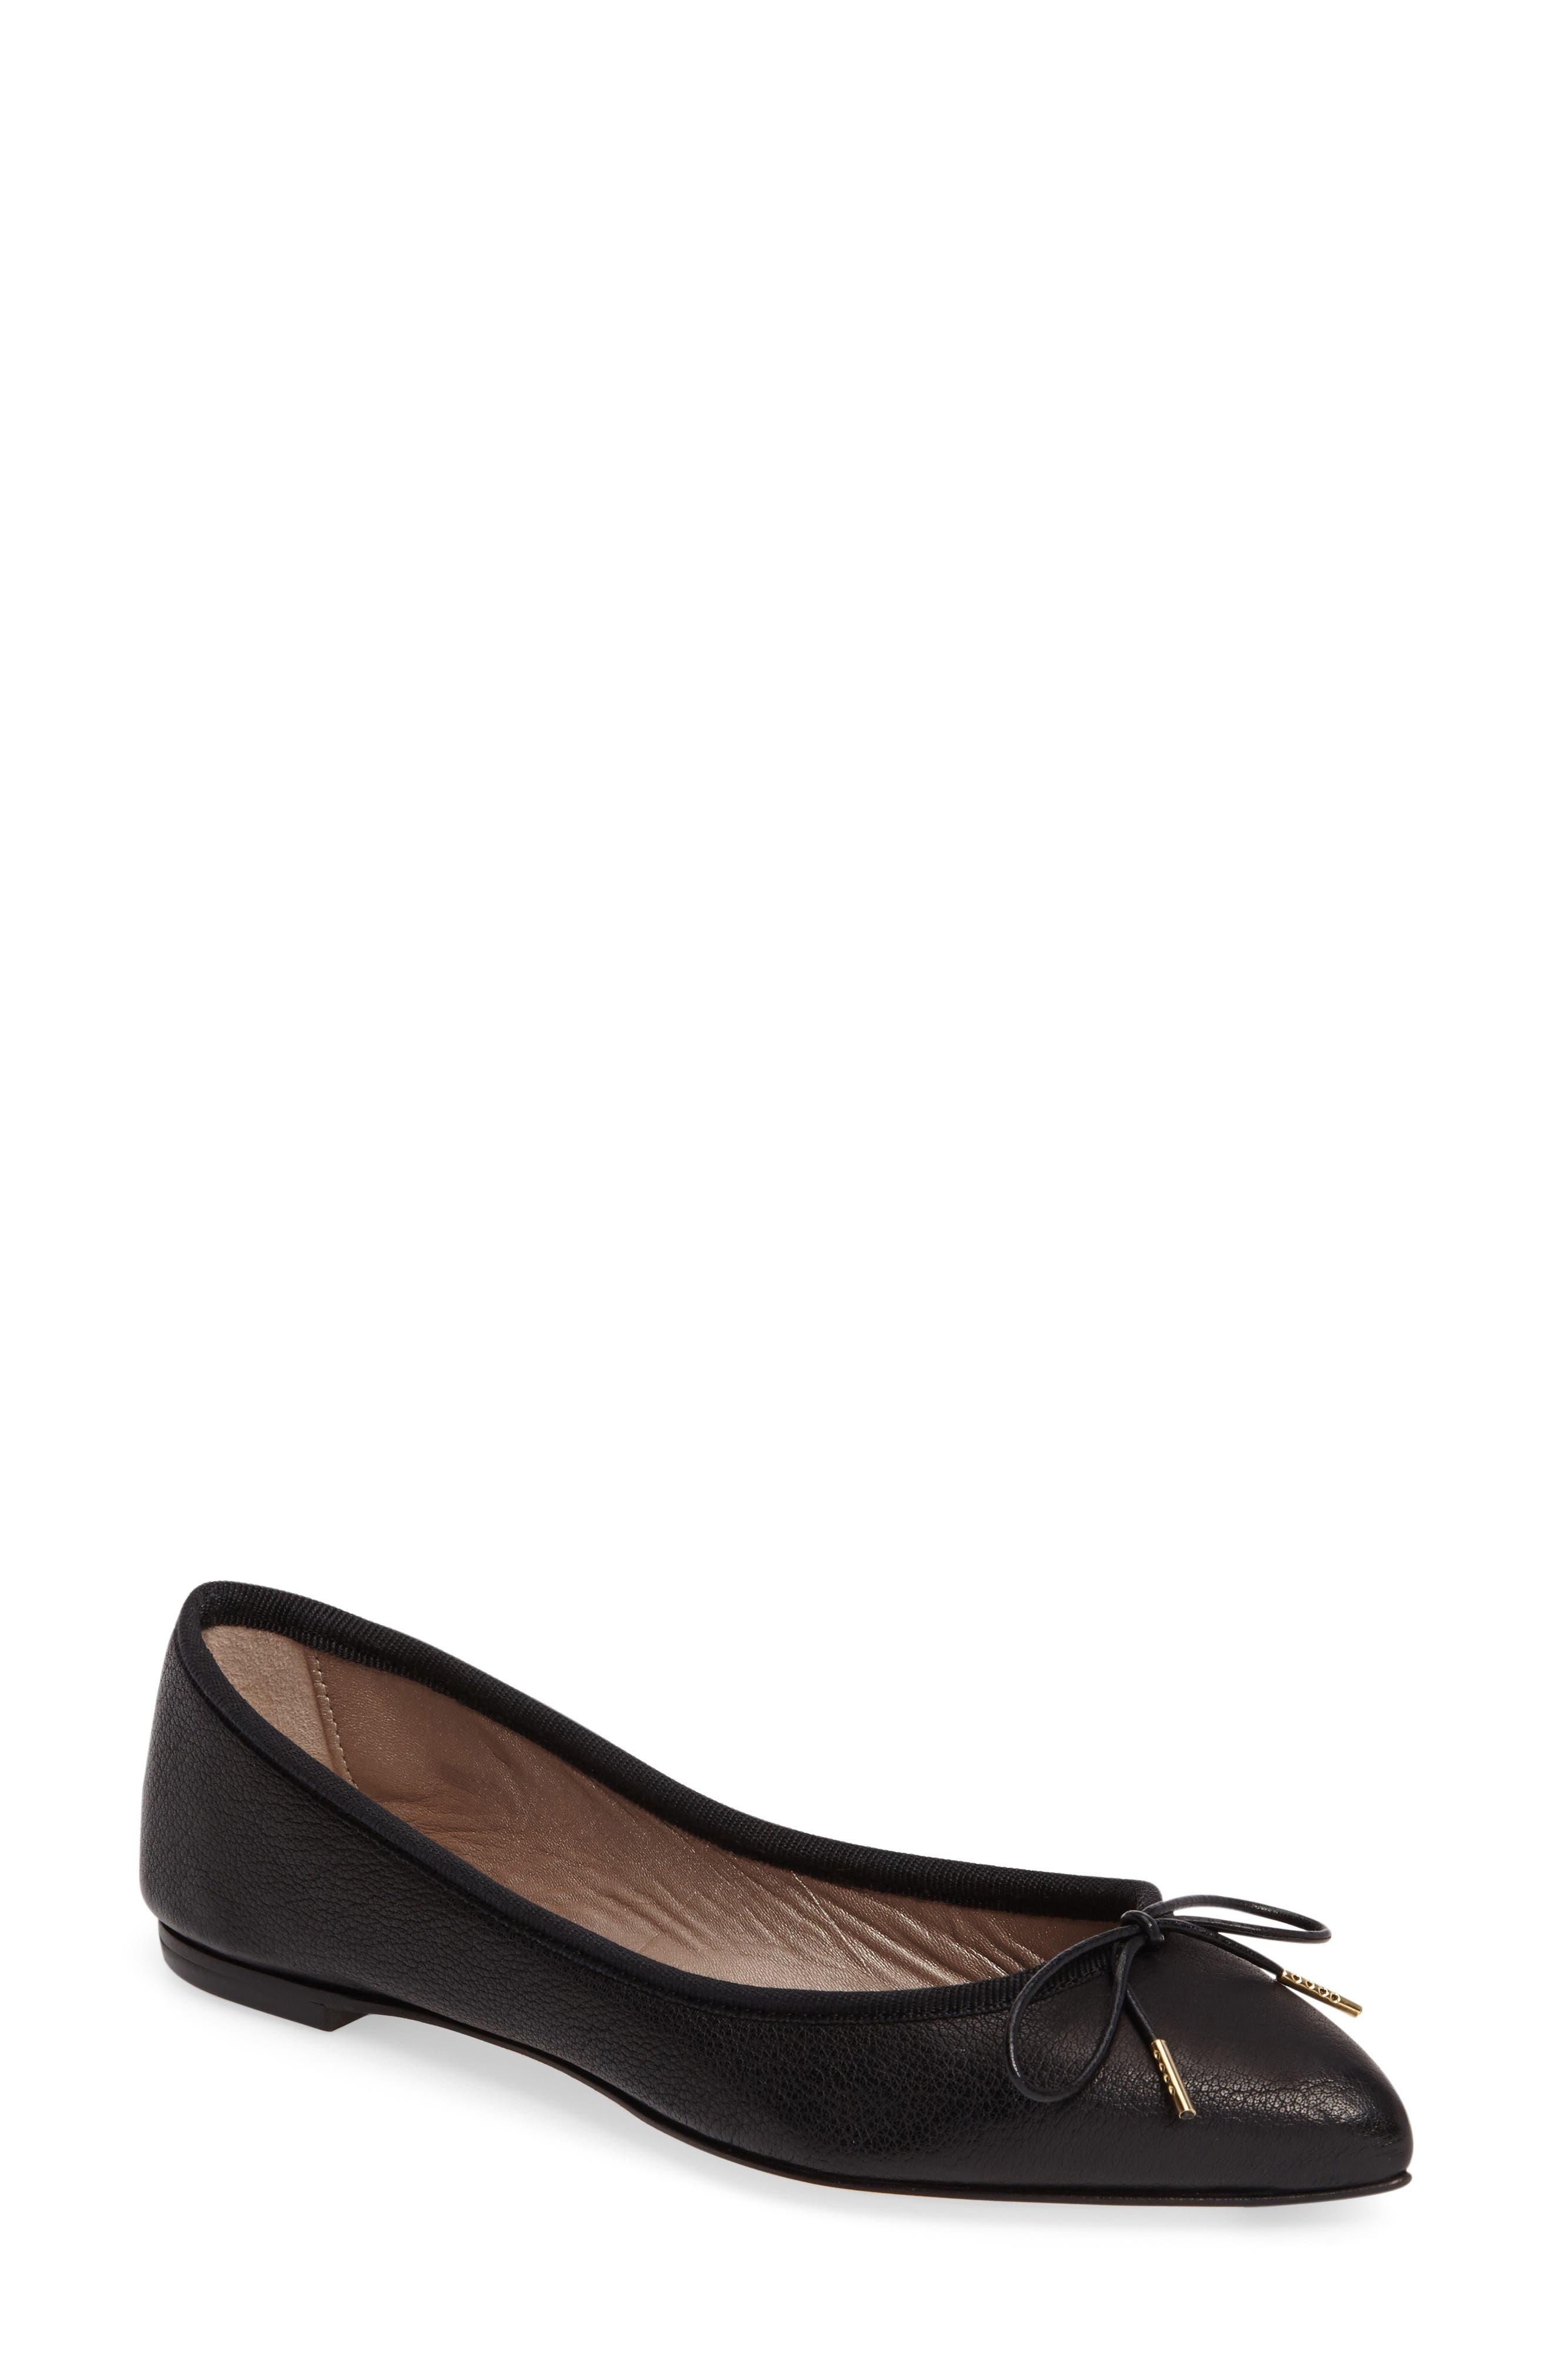 Alternate Image 1 Selected - AGL Sacchetto Pointy Toe Flat (Women)